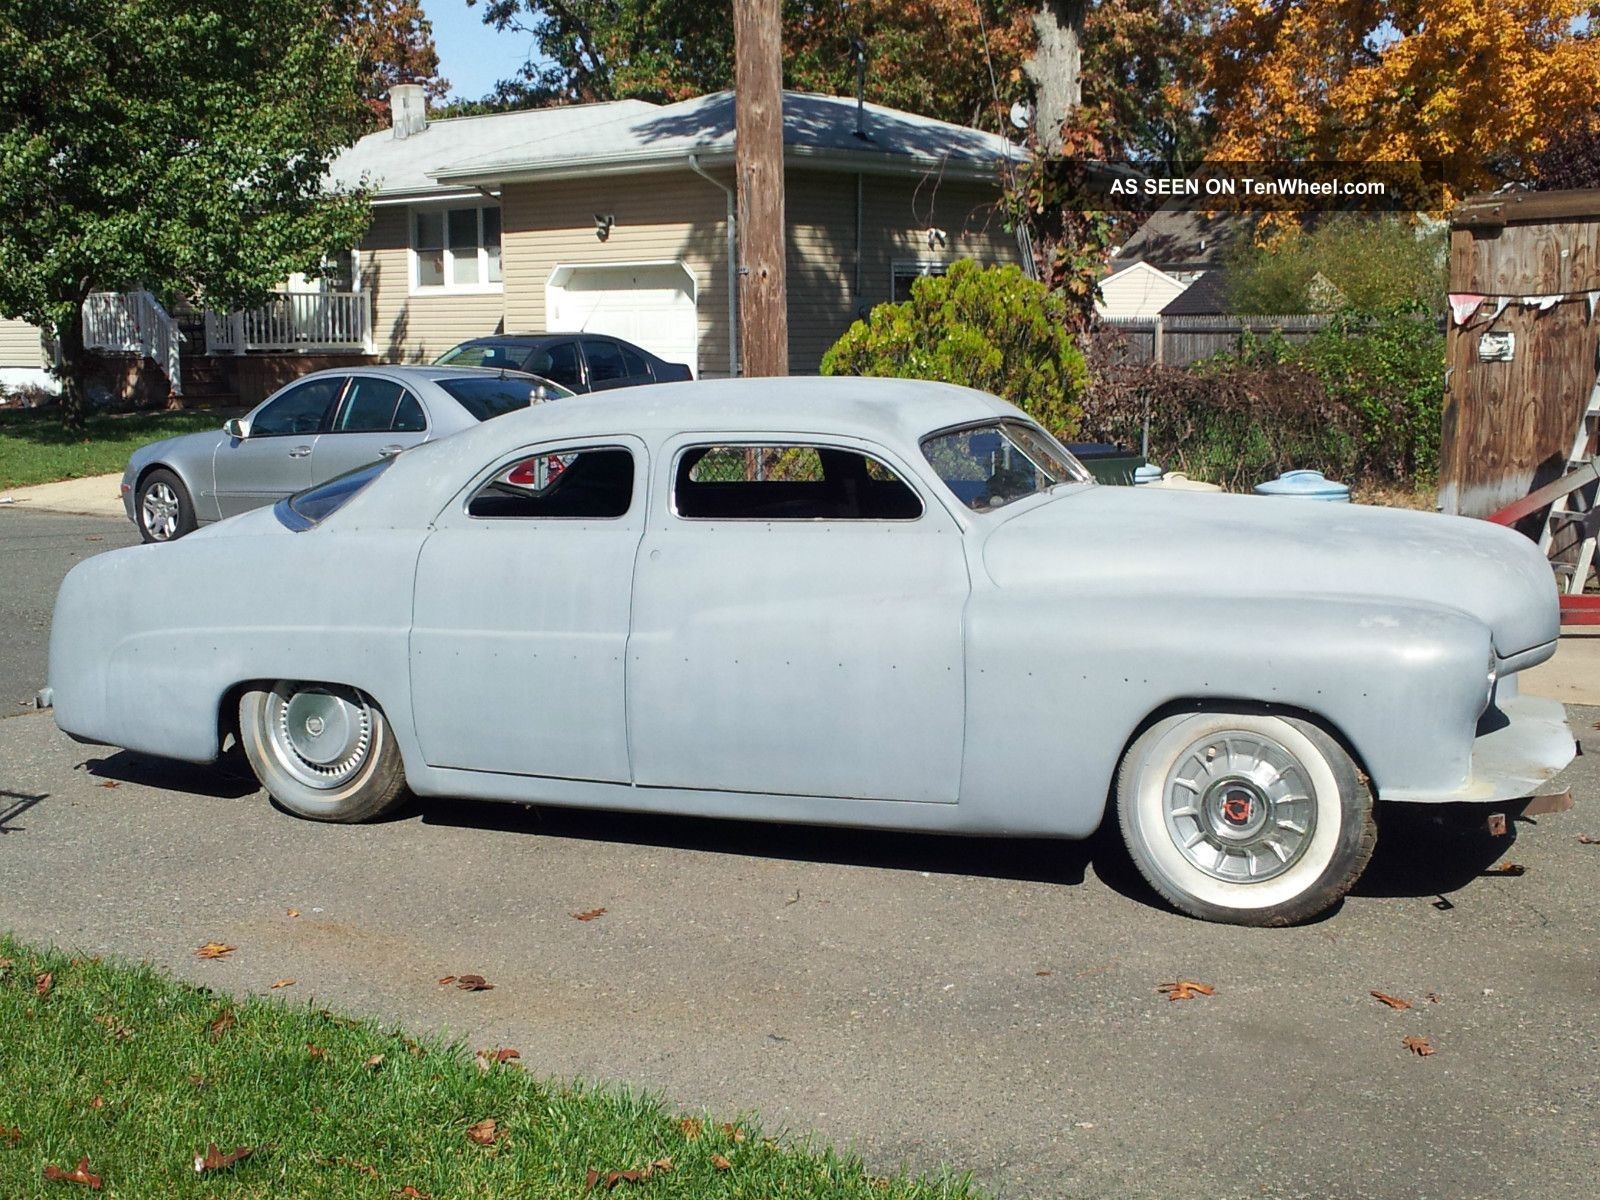 1951 Mercury Custom Sedan - Chevy 350 W / Camaro Subframe Other photo